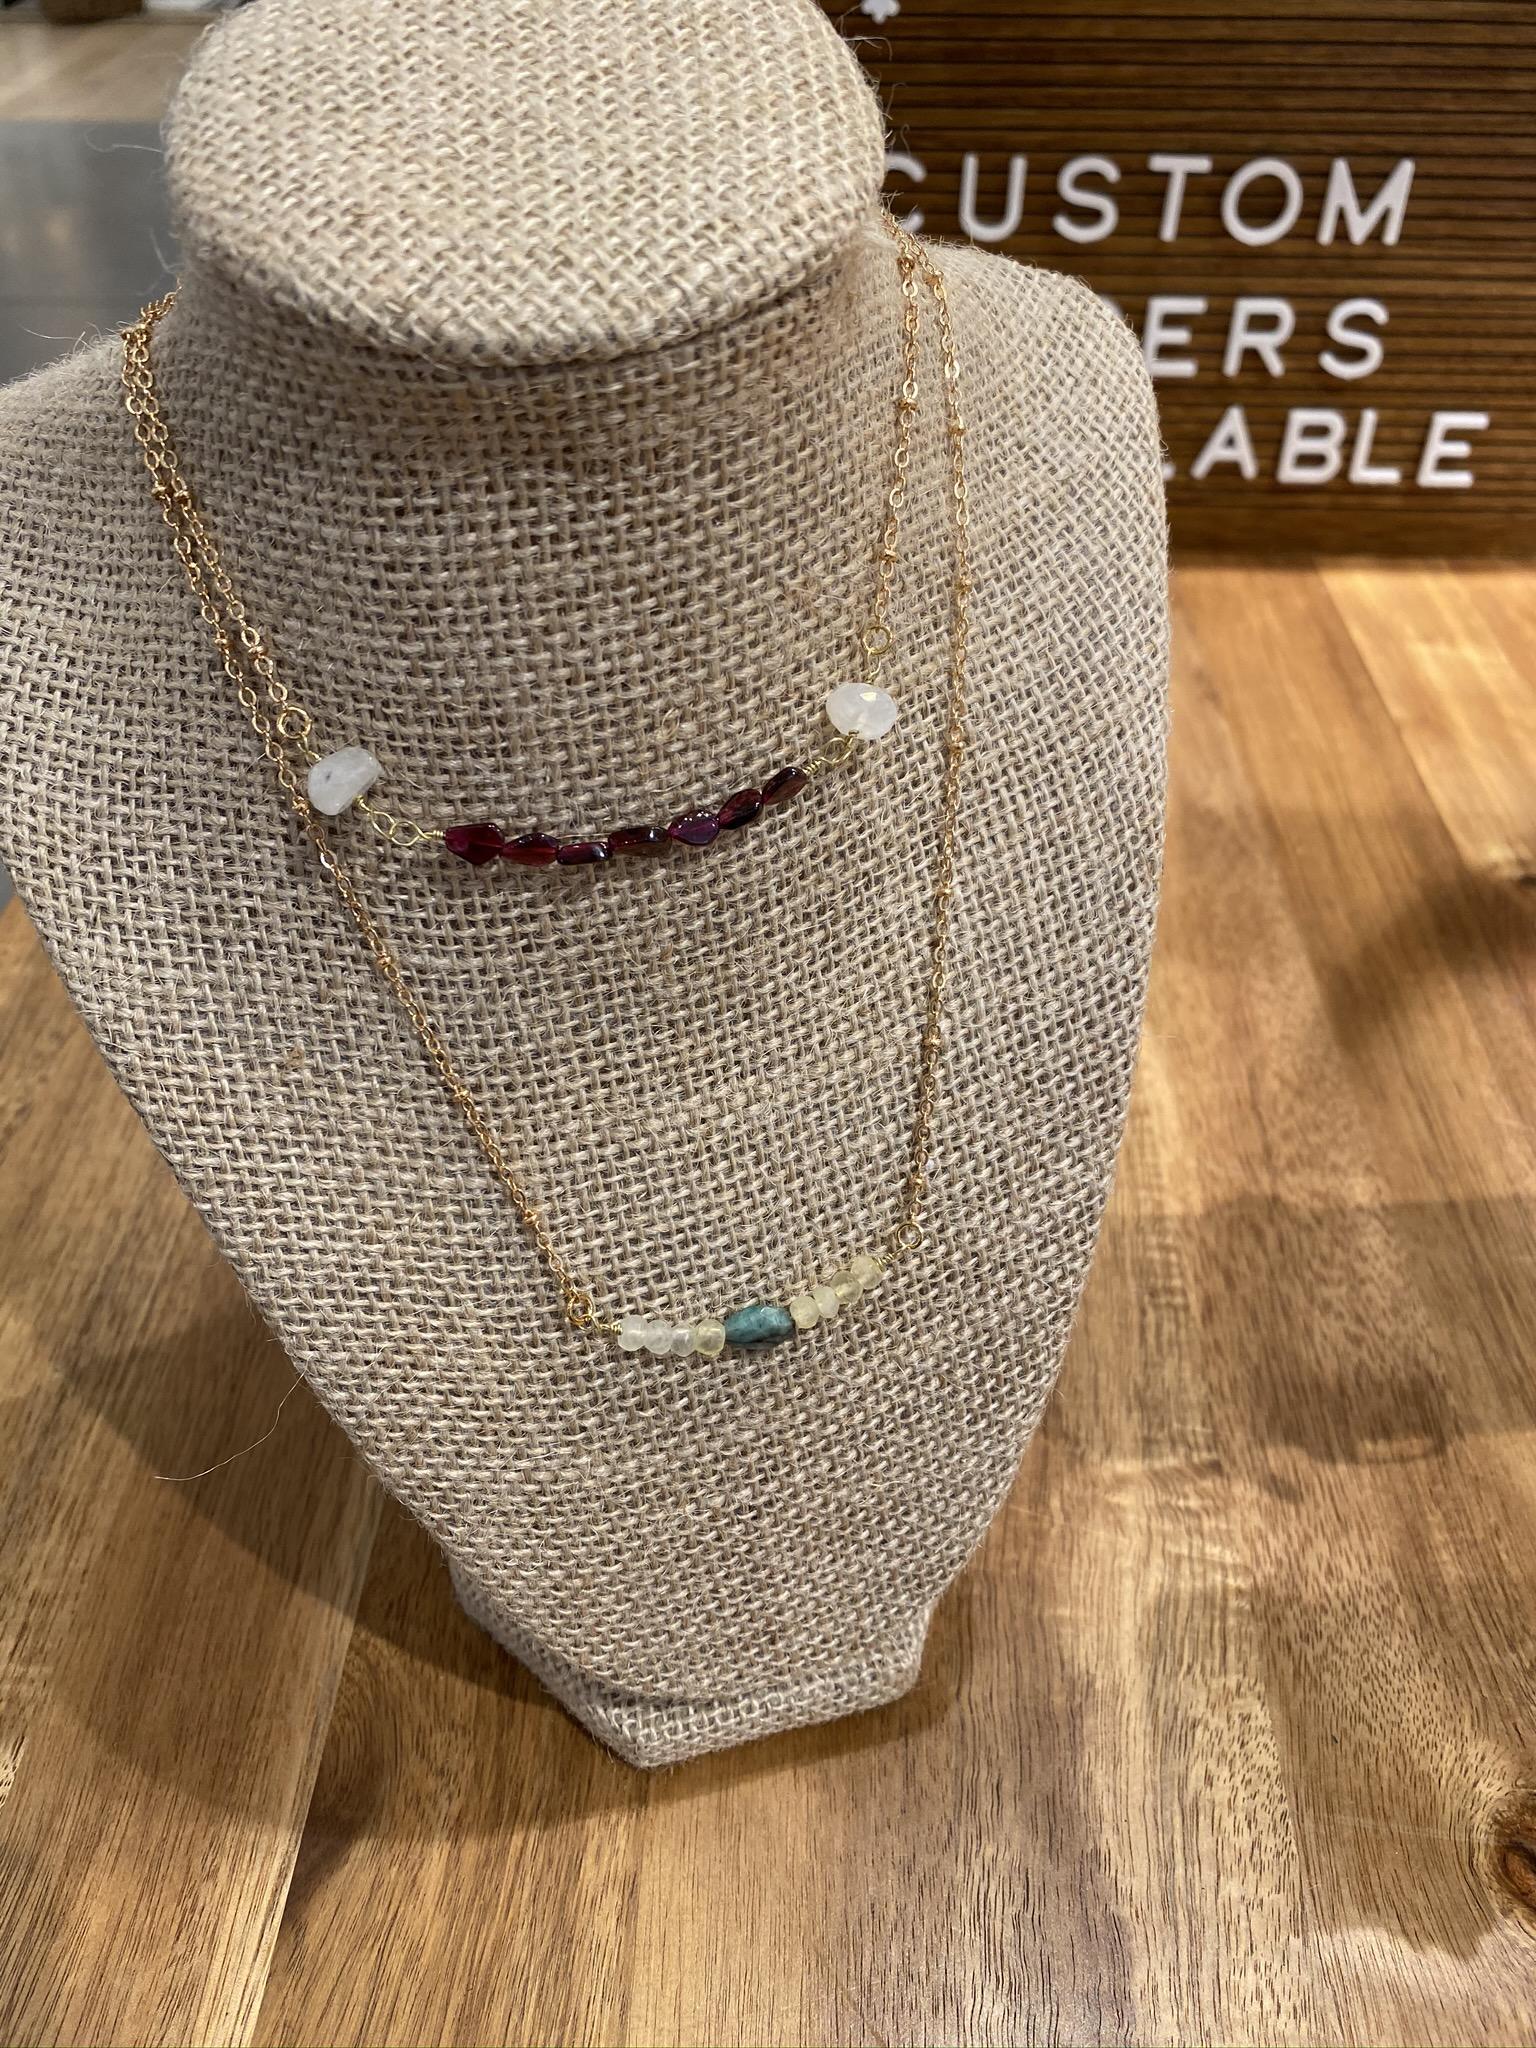 Chandra Designs Jewelry